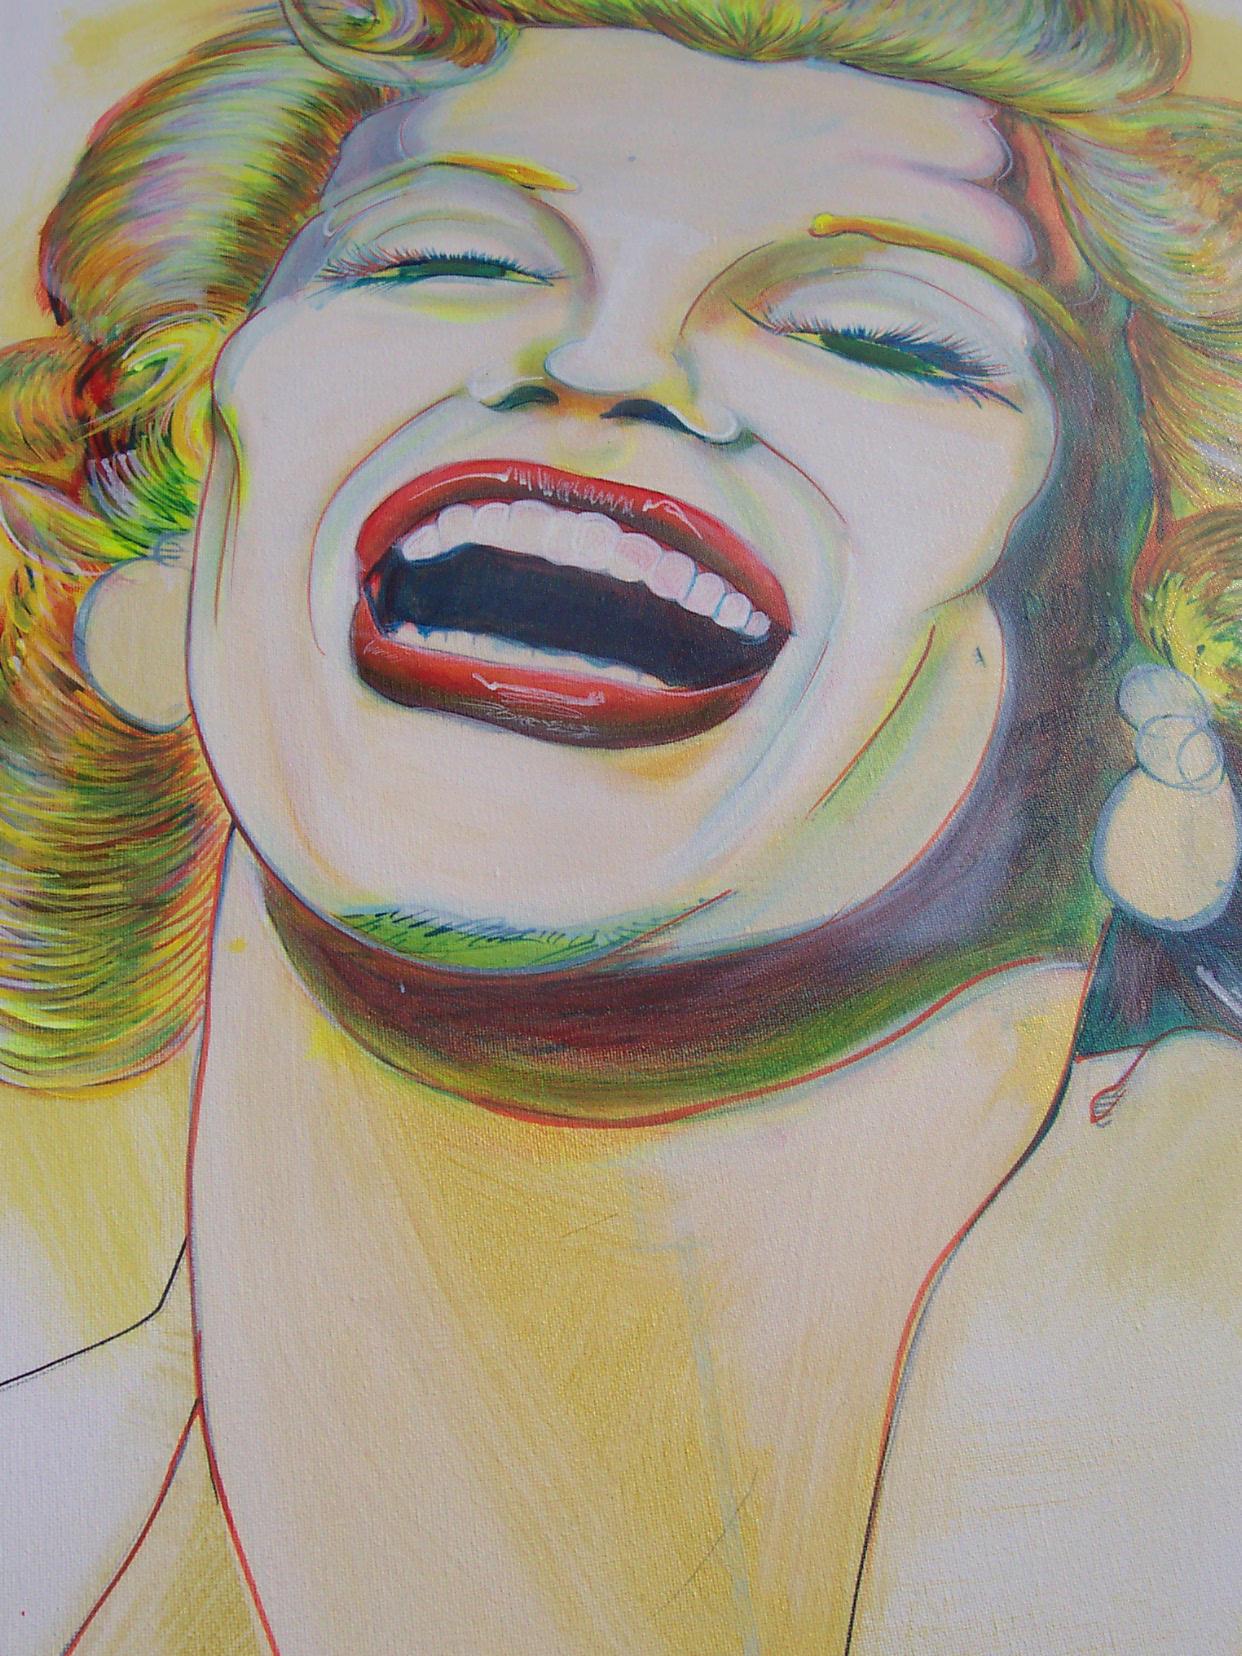 Shahid Brown Master Artist by shahid69